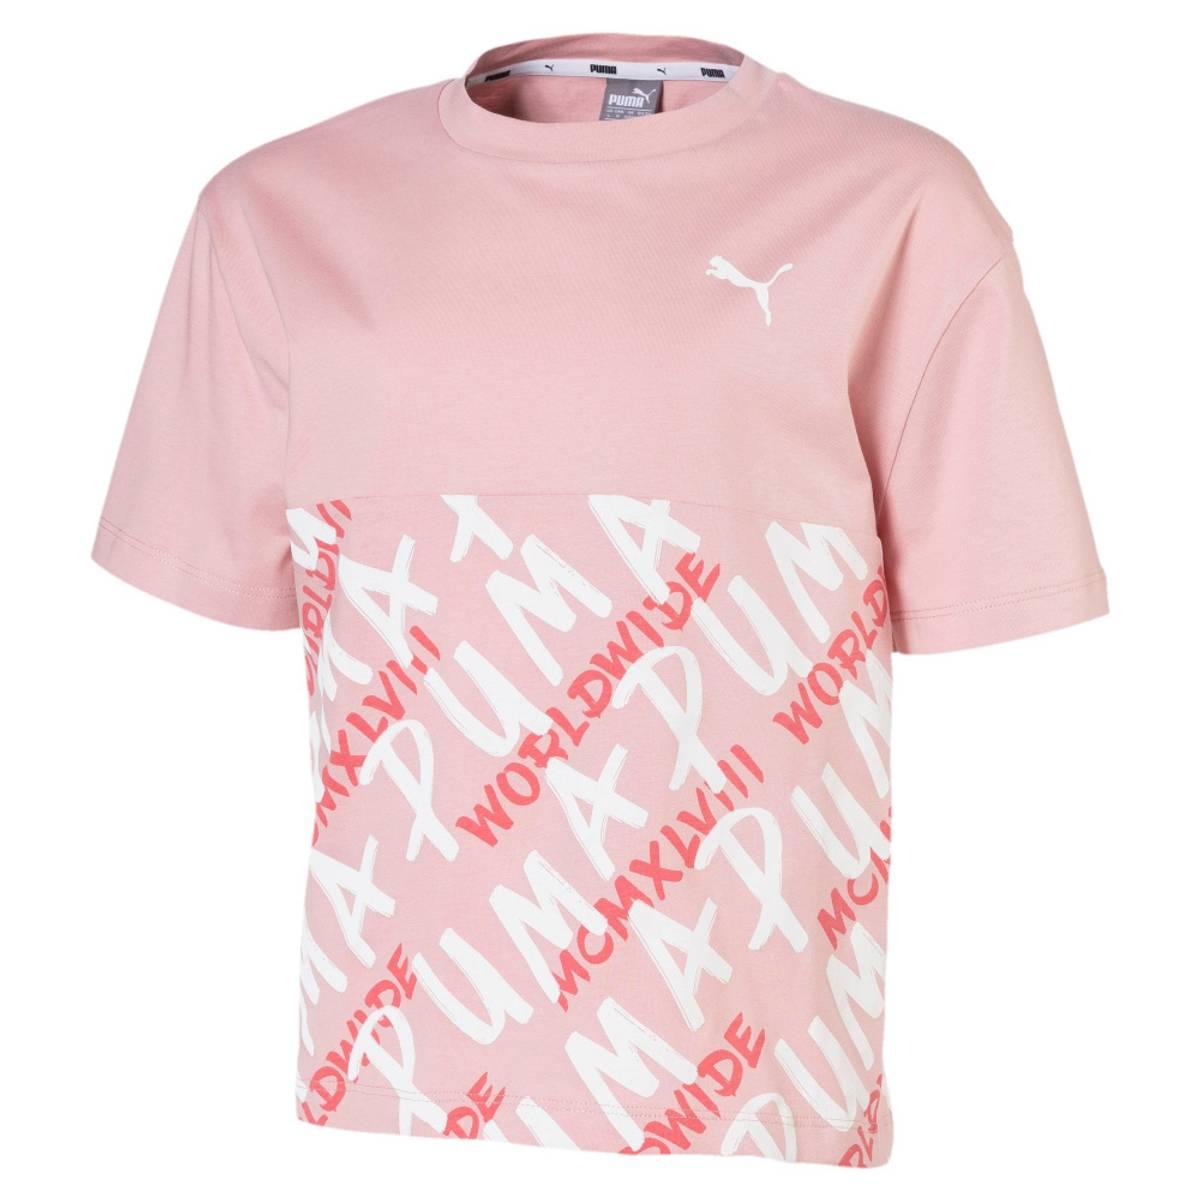 Rosa Puma Alpha Aop Tee Girl T-skjorte